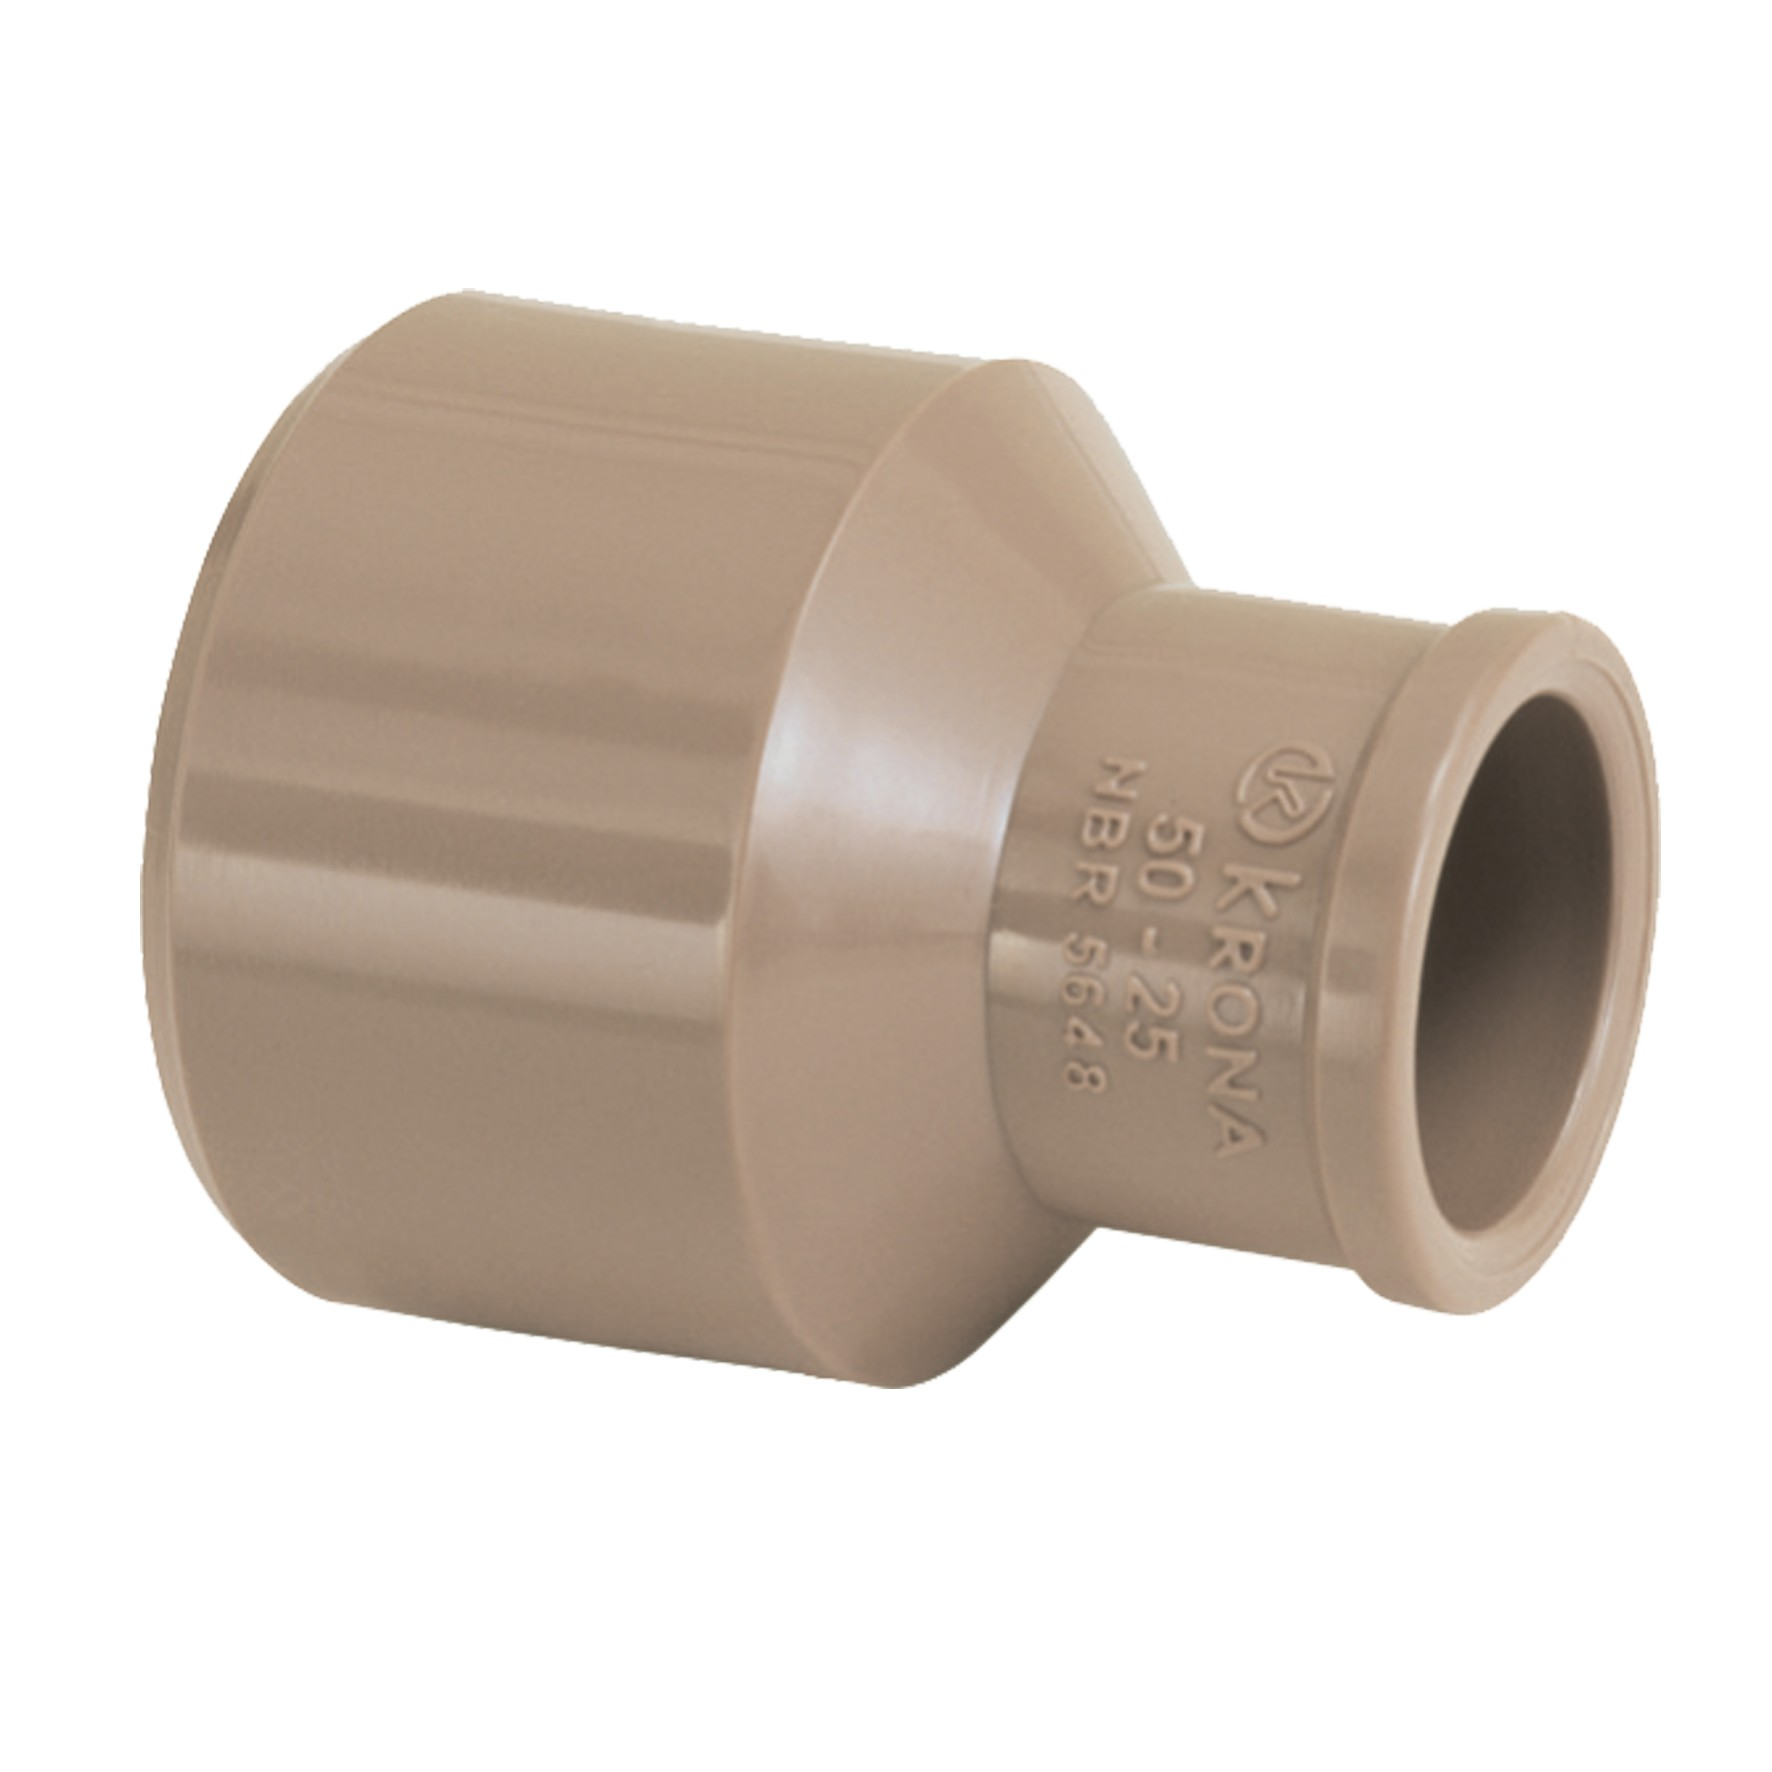 Bucha Longa Simples Soldavel de PVC 60mm 373 - Krona